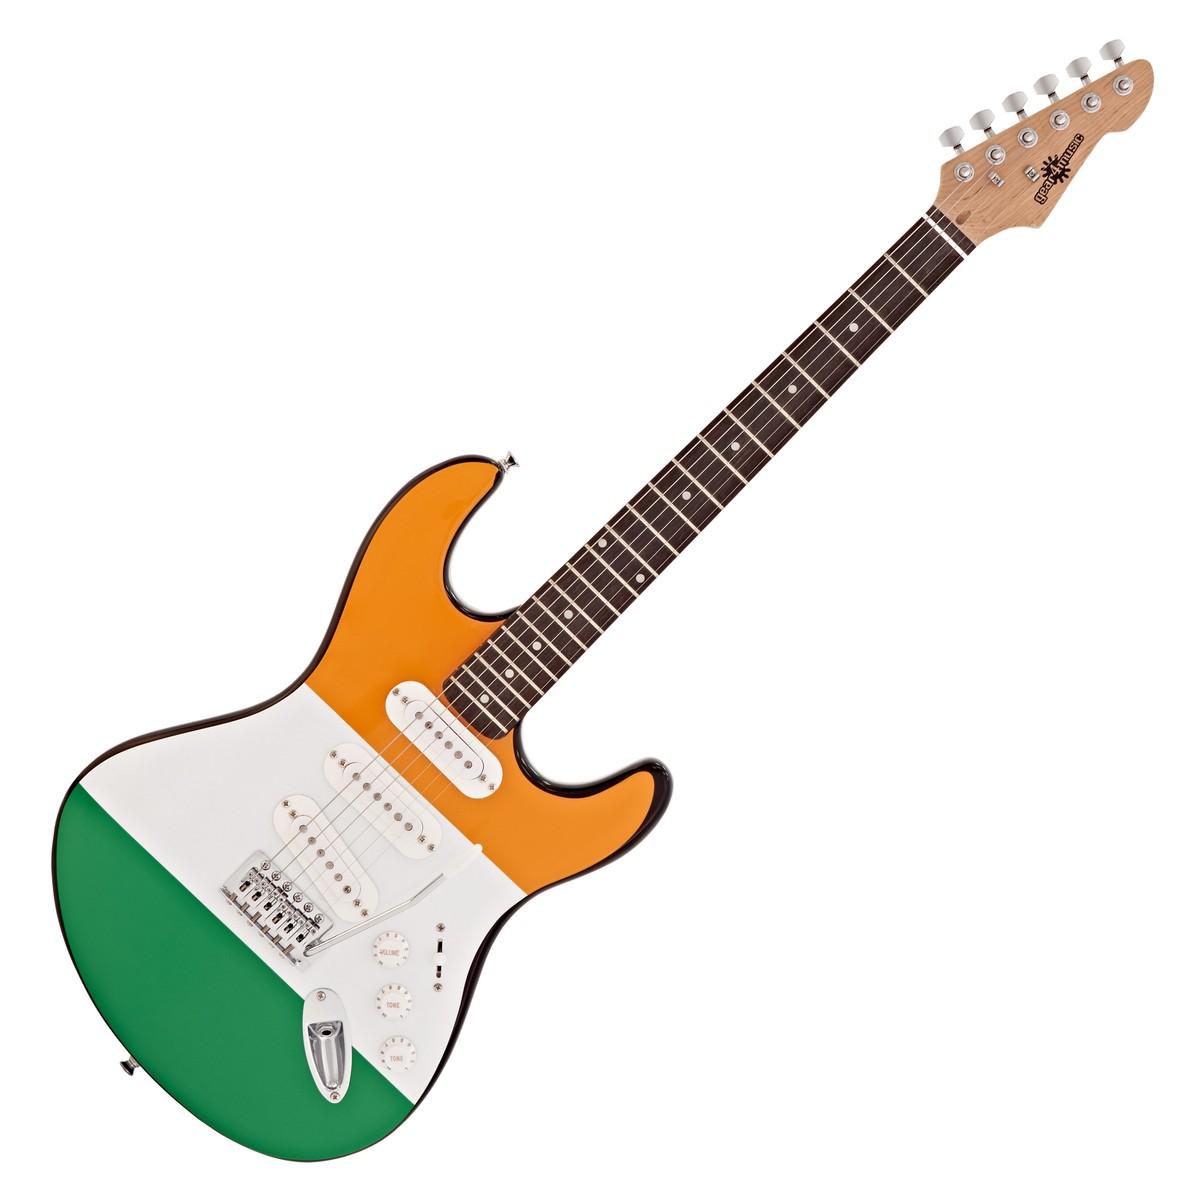 la electric guitar by gear4music irish flag at gear4music com